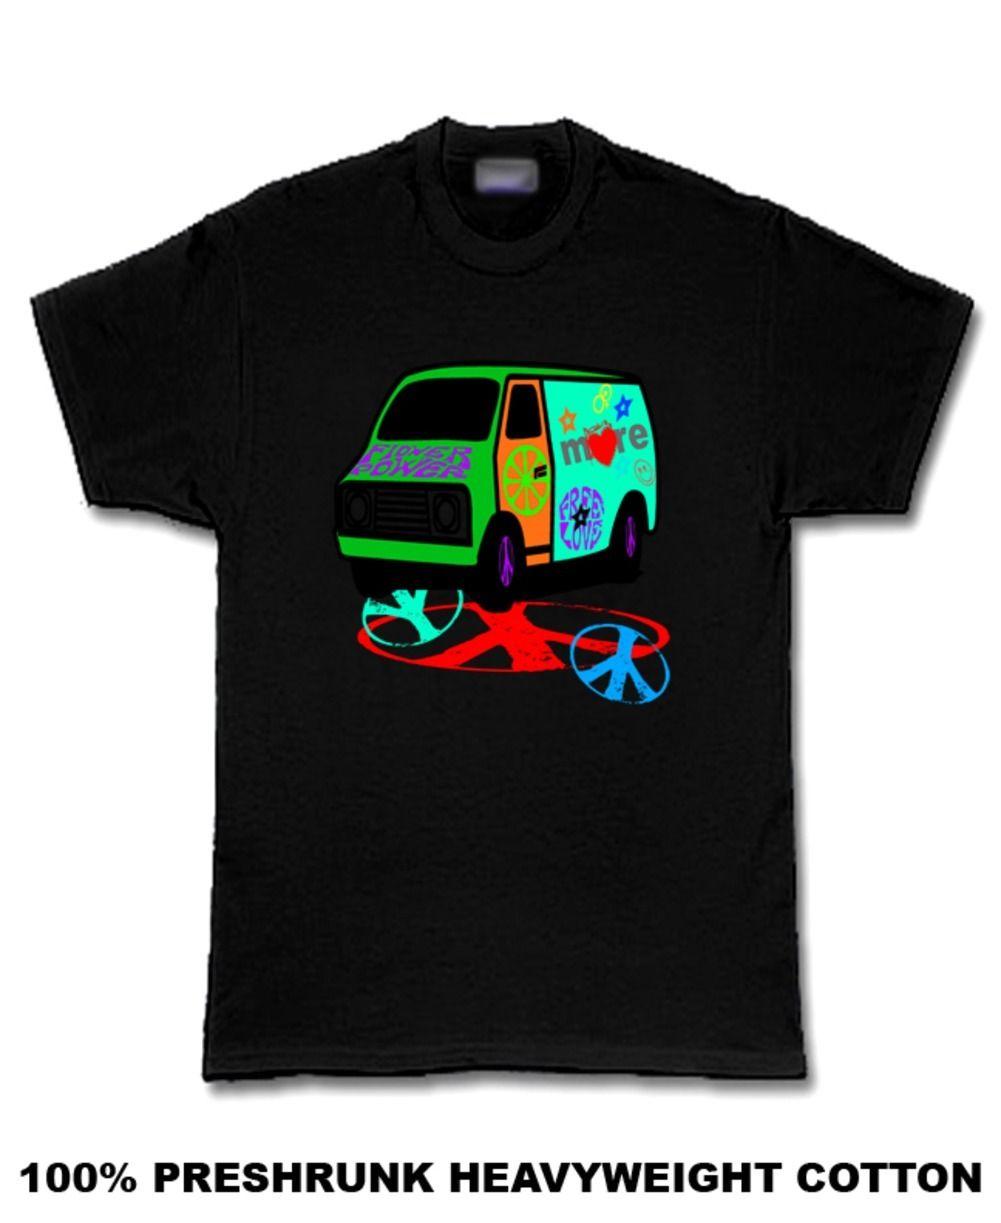 More Love 70s Van for black new age hippie T Shirt Cartoon t shirt men Unisex New Fashion tshirt free shipping top ajax 2018